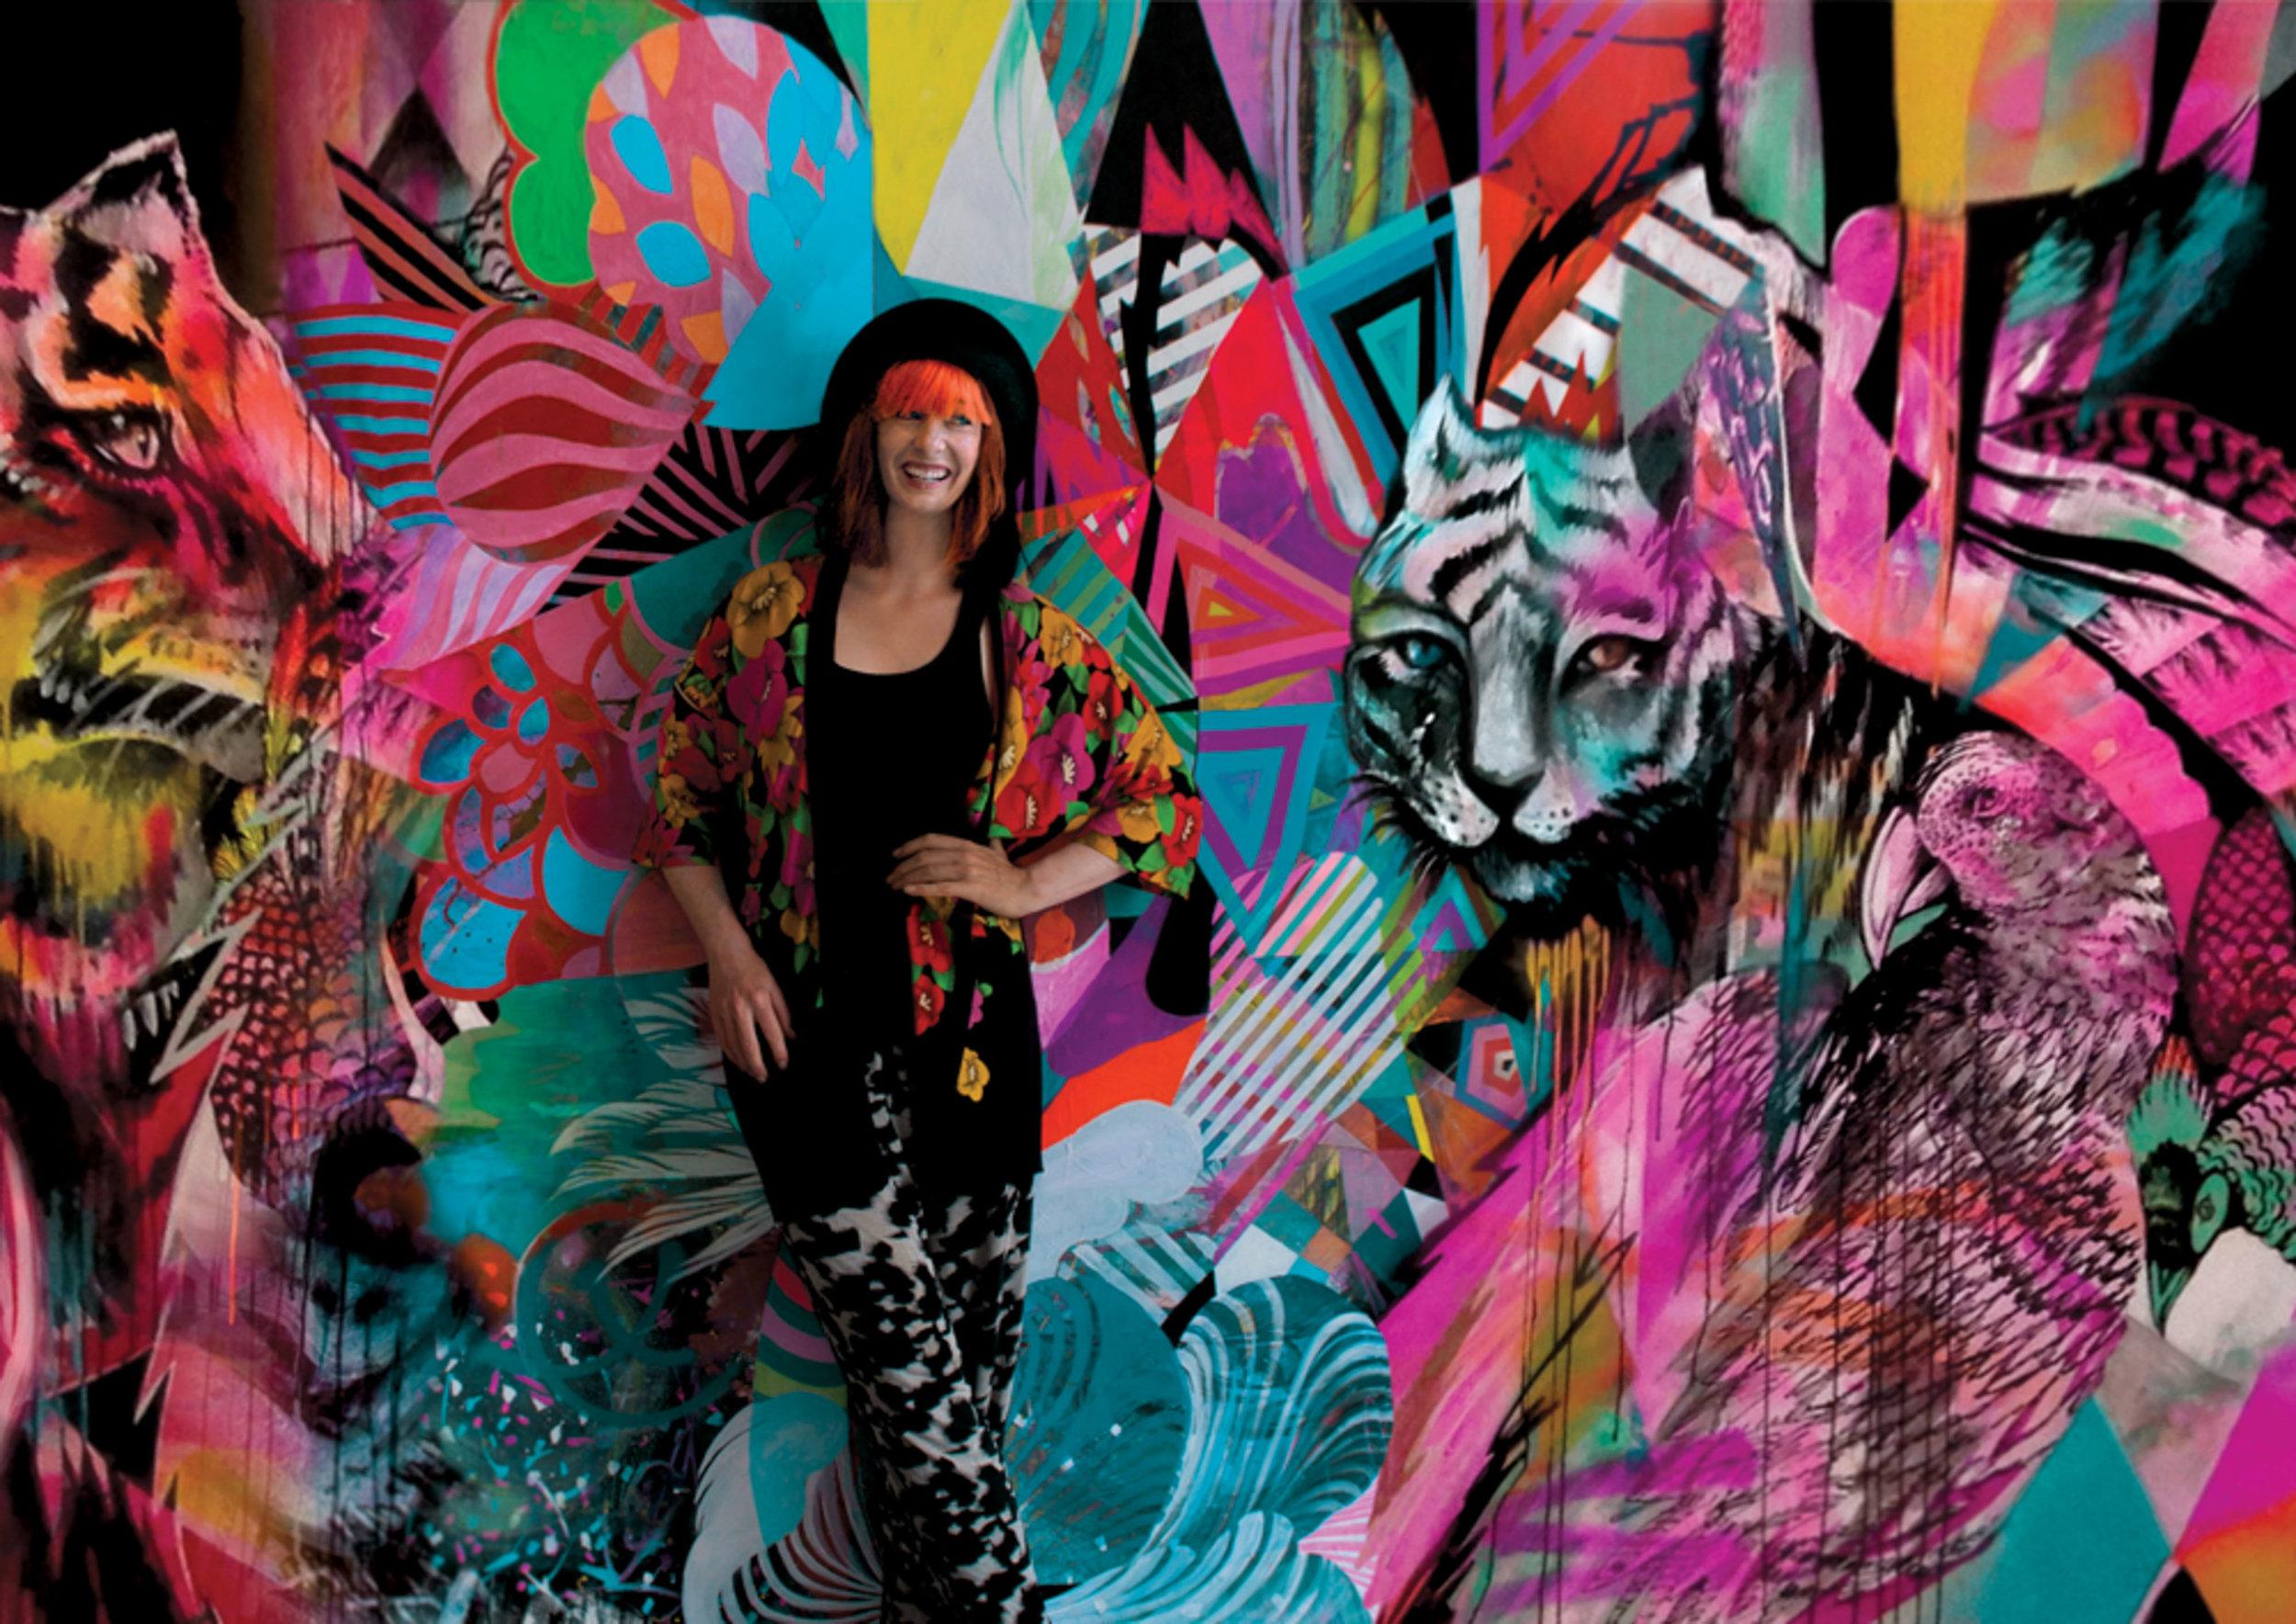 Artist Shannon Crees